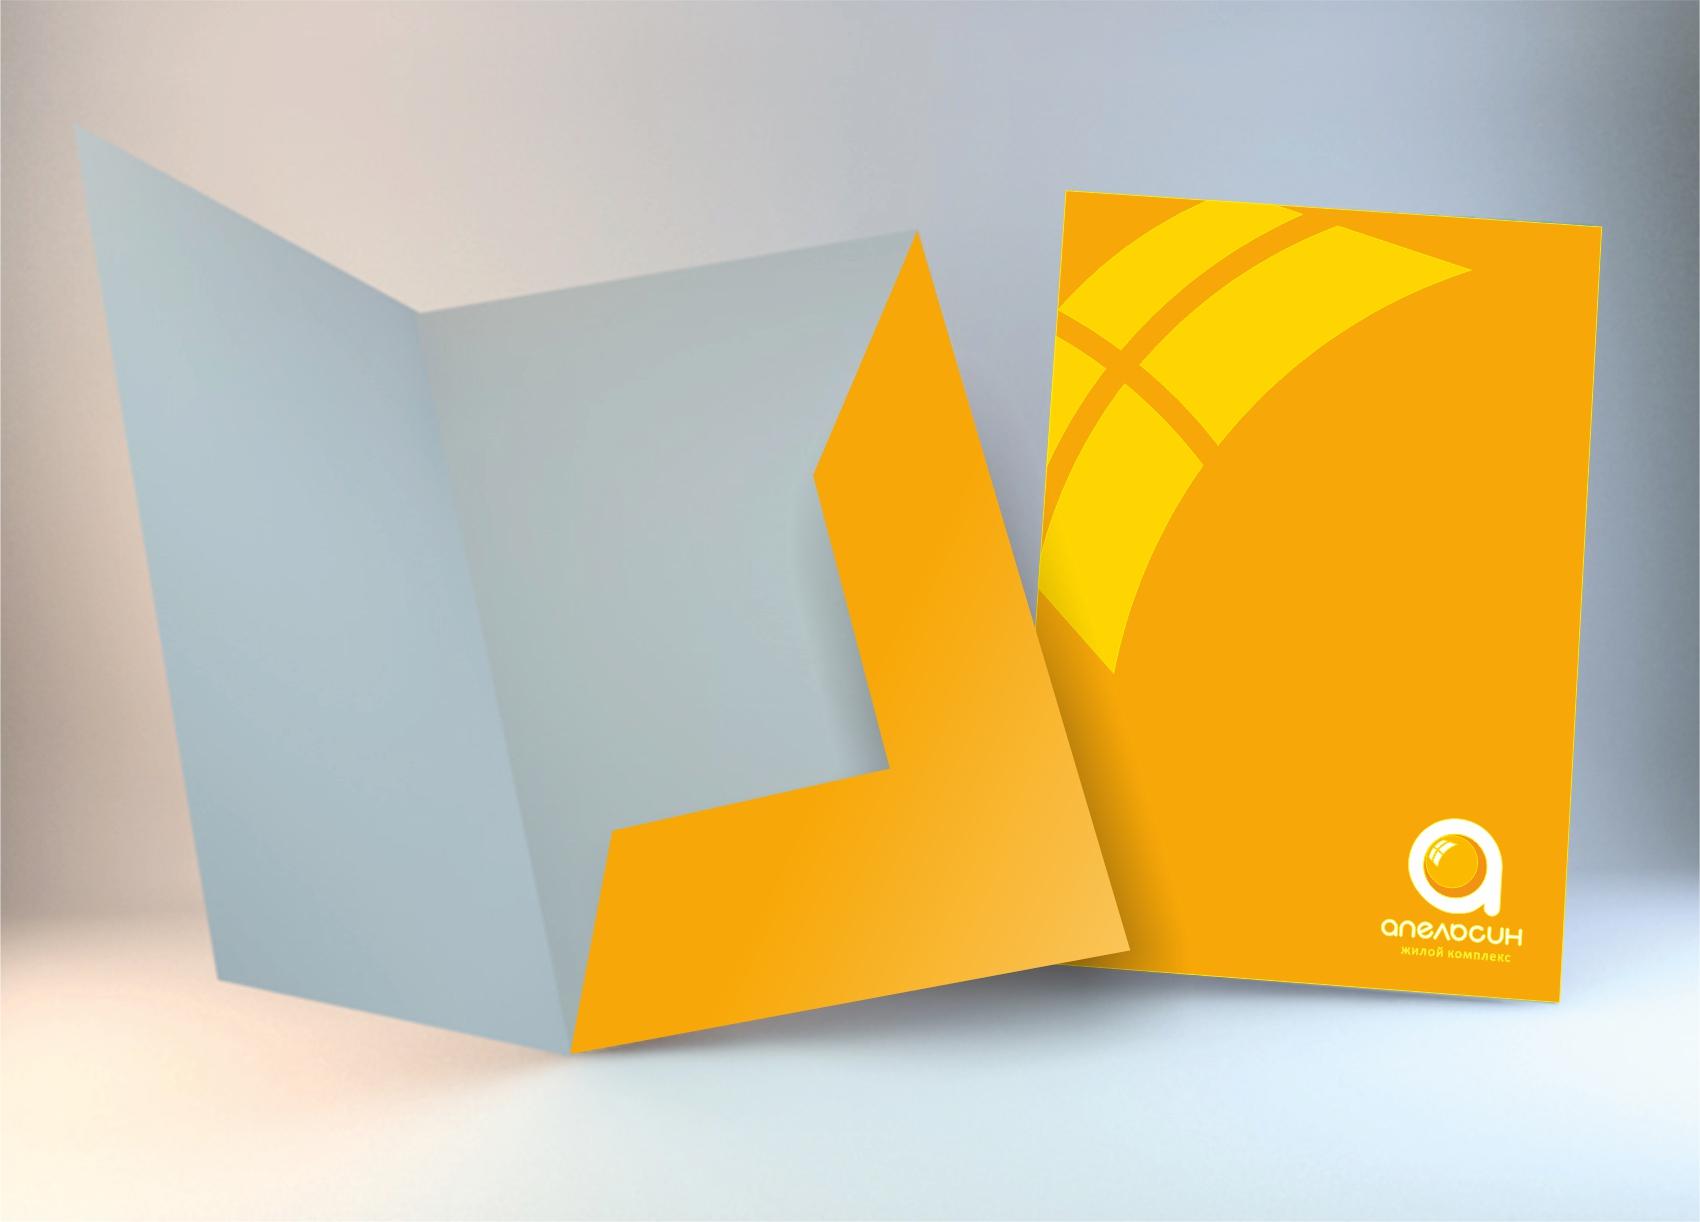 Логотип и фирменный стиль фото f_7705a719b1bd736c.jpg